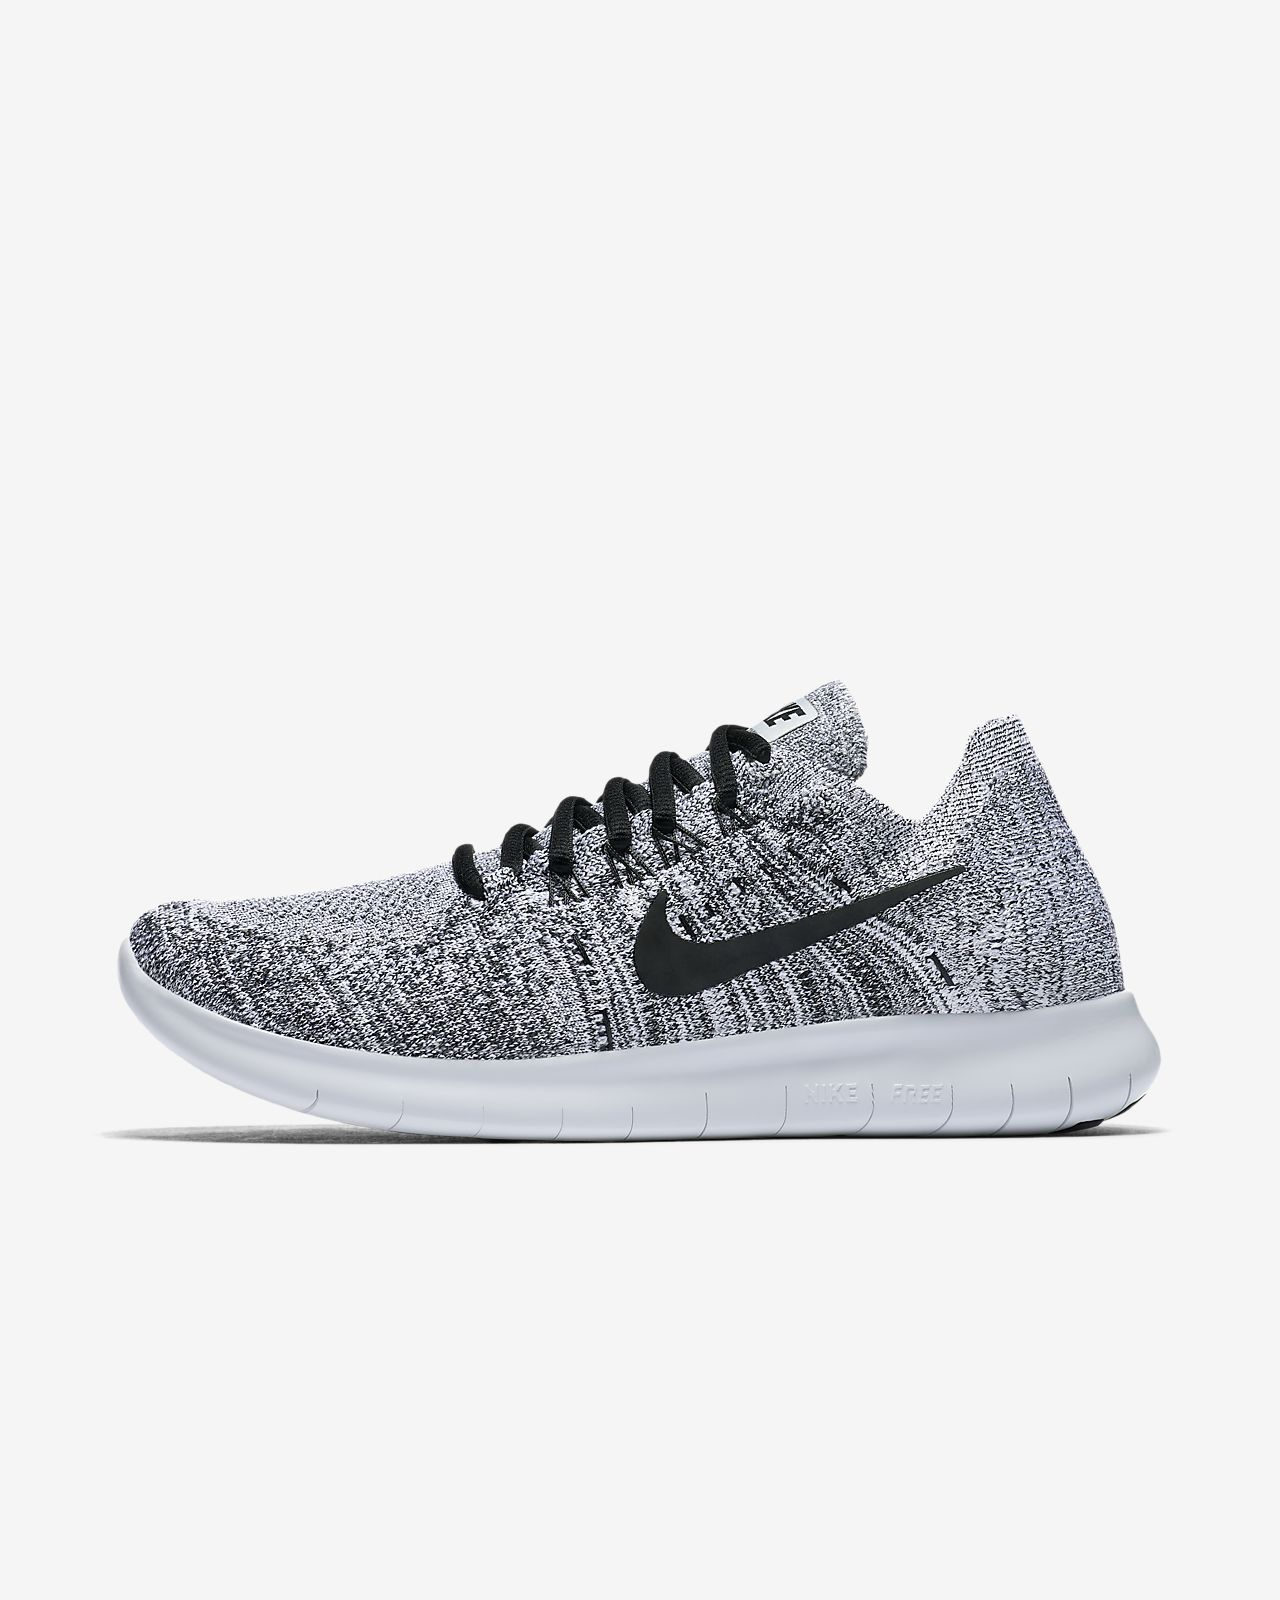 409e7cee965fe Nike Free RN Flyknit 2017 Women's Running Shoe | Shoes! | Nike ...